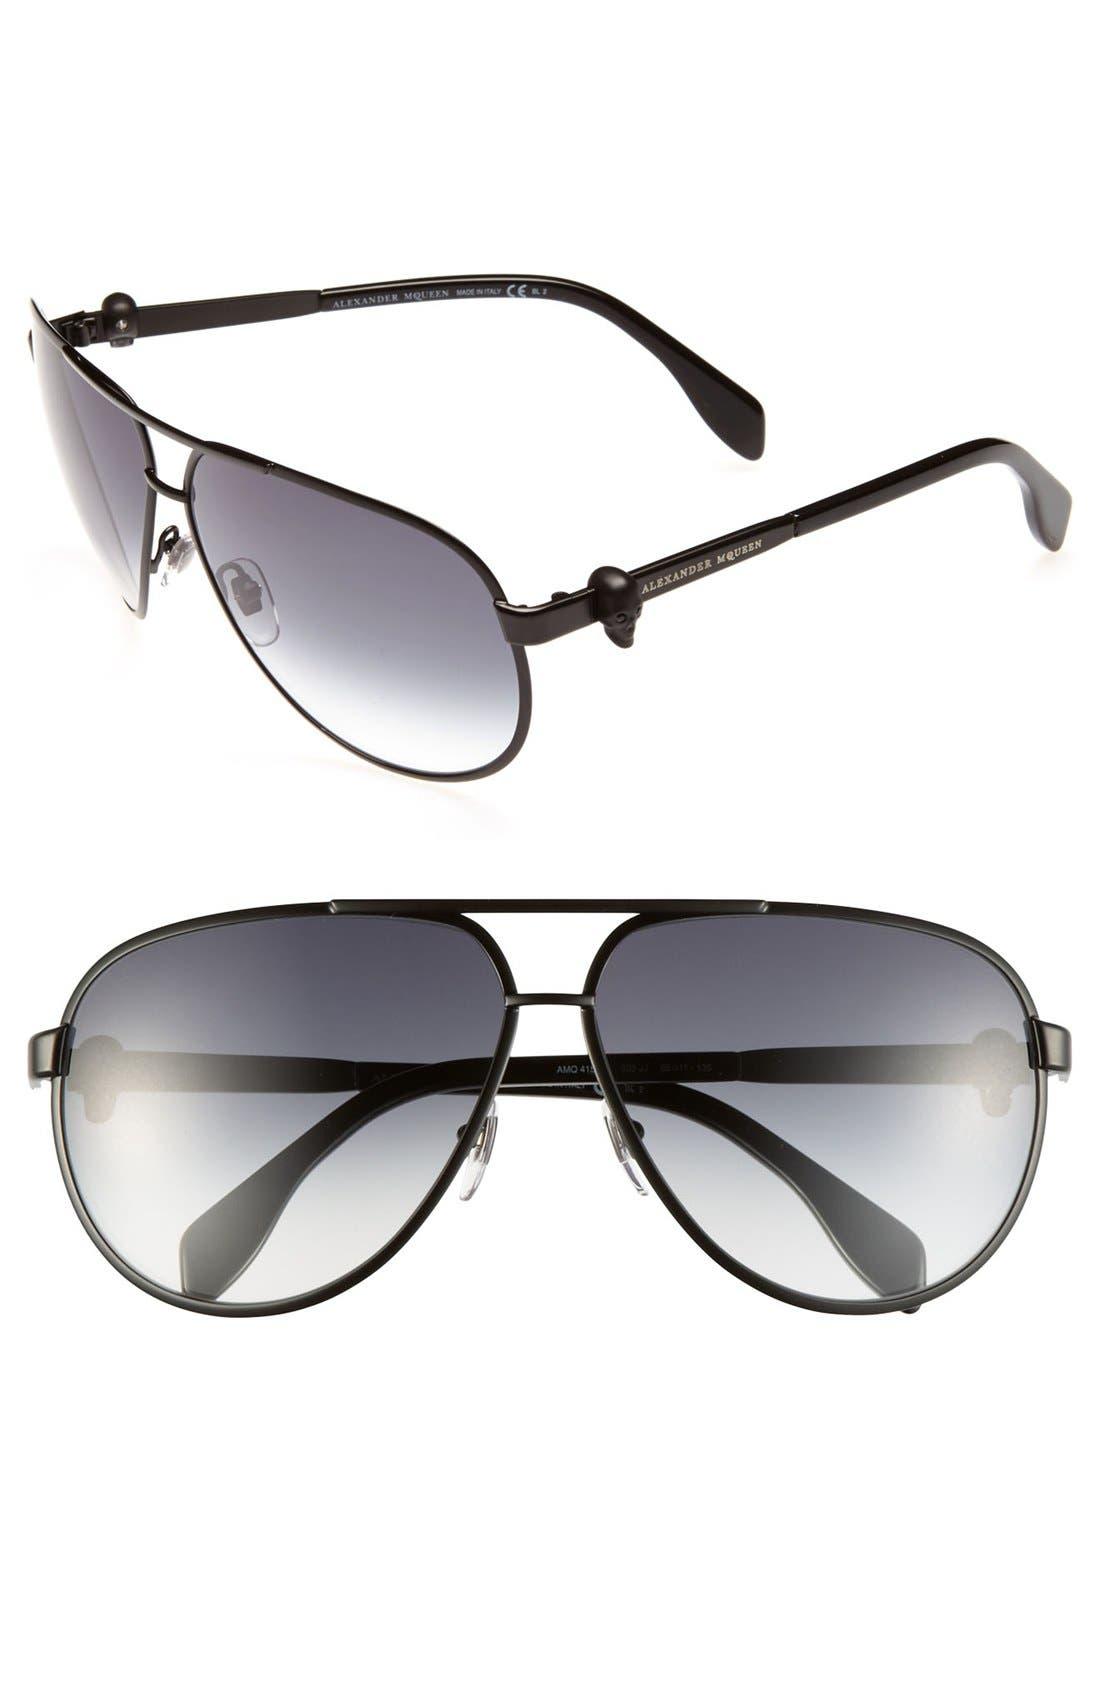 65mm Skull Temple Metal Aviator Sunglasses,                             Main thumbnail 1, color,                             001